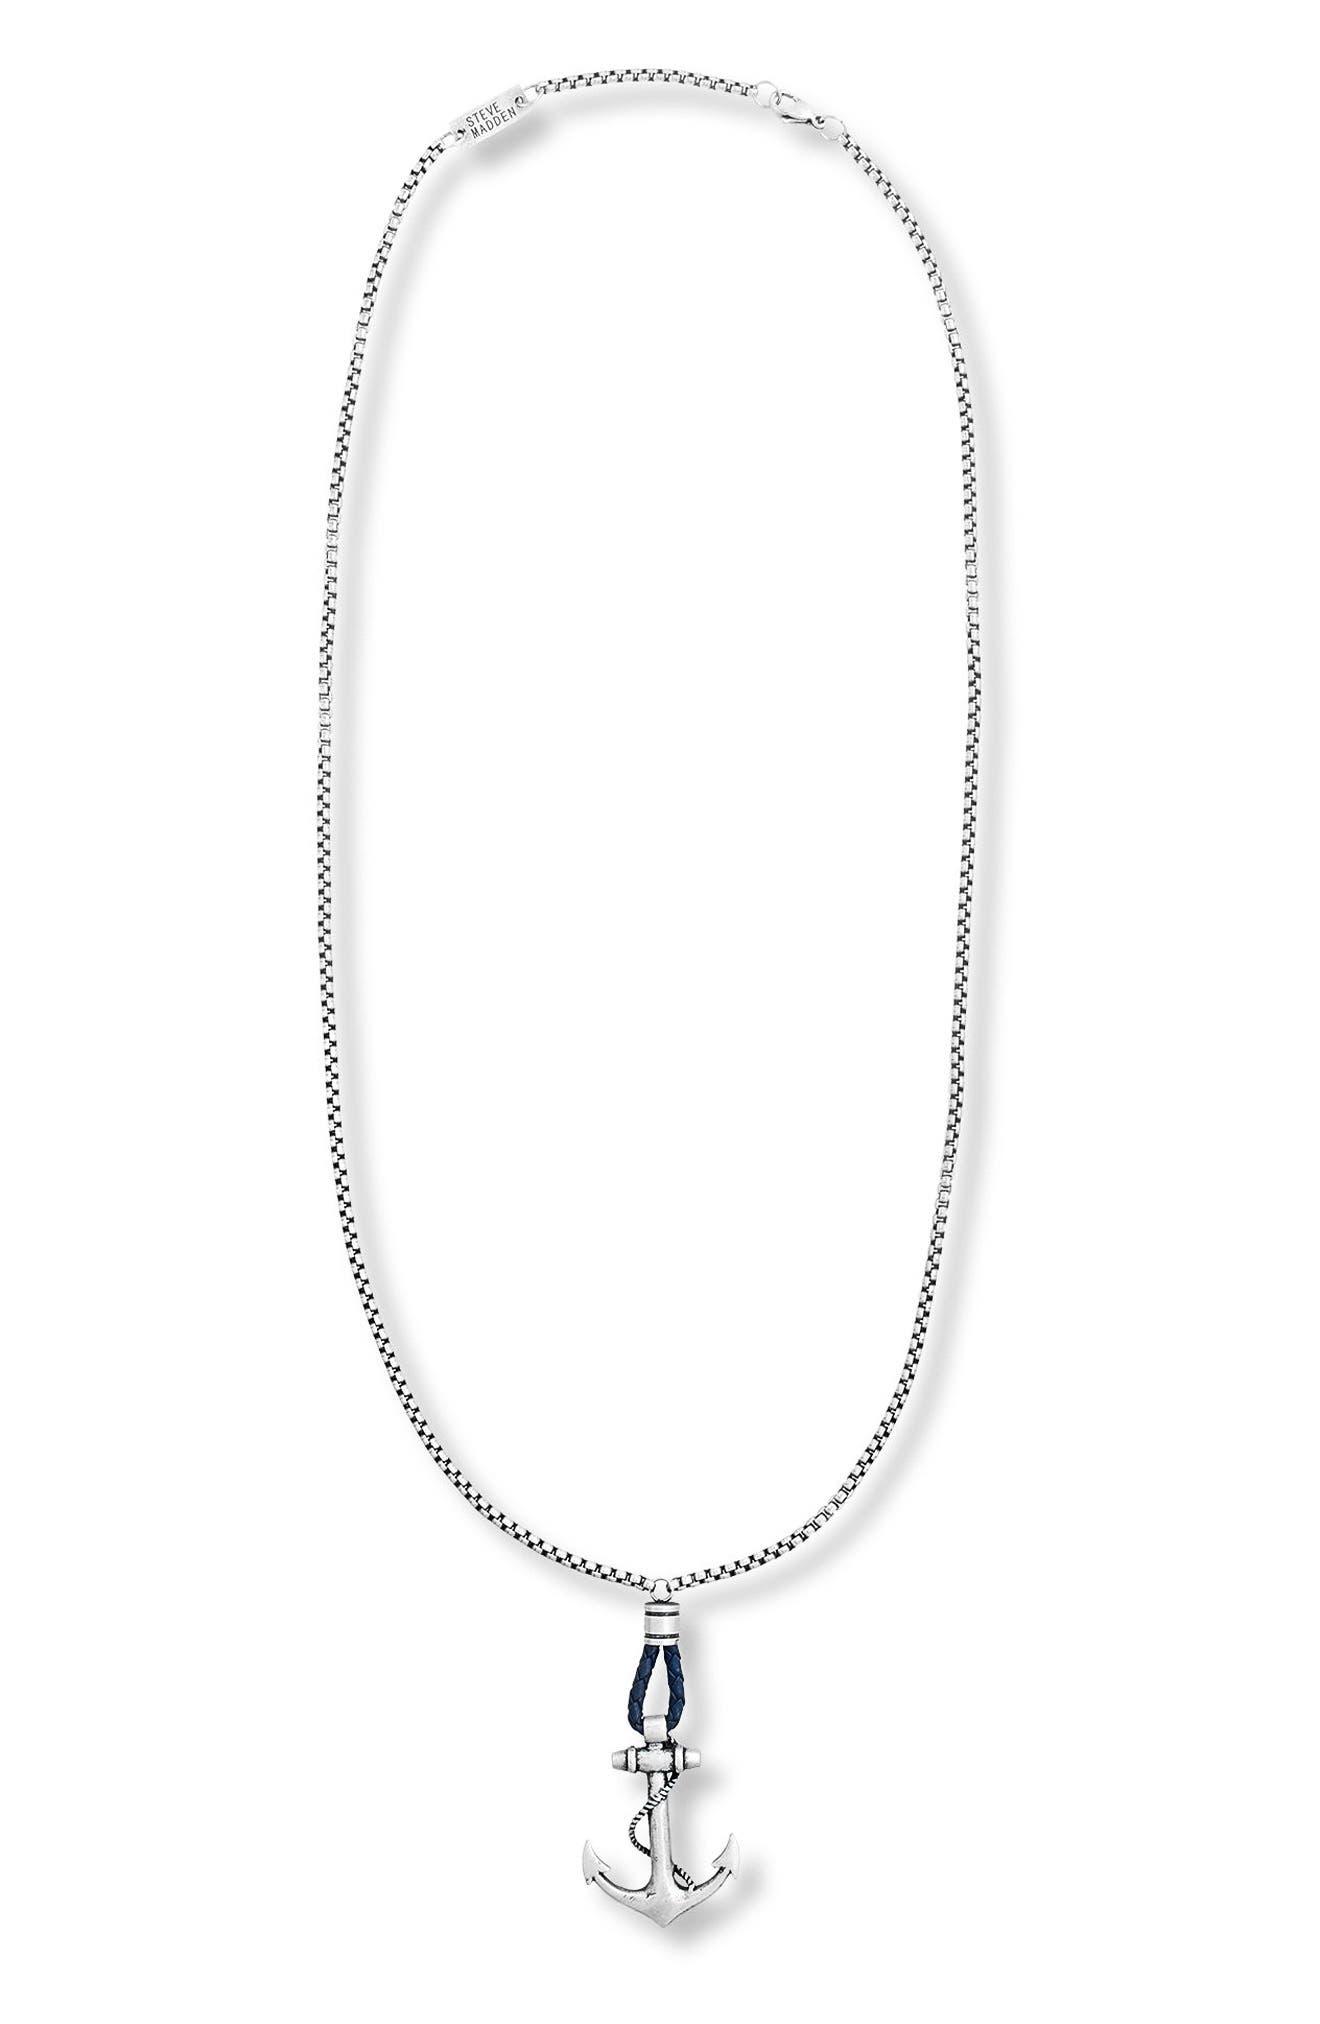 Oxidized Anchor Pendant Necklace,                         Main,                         color, 401